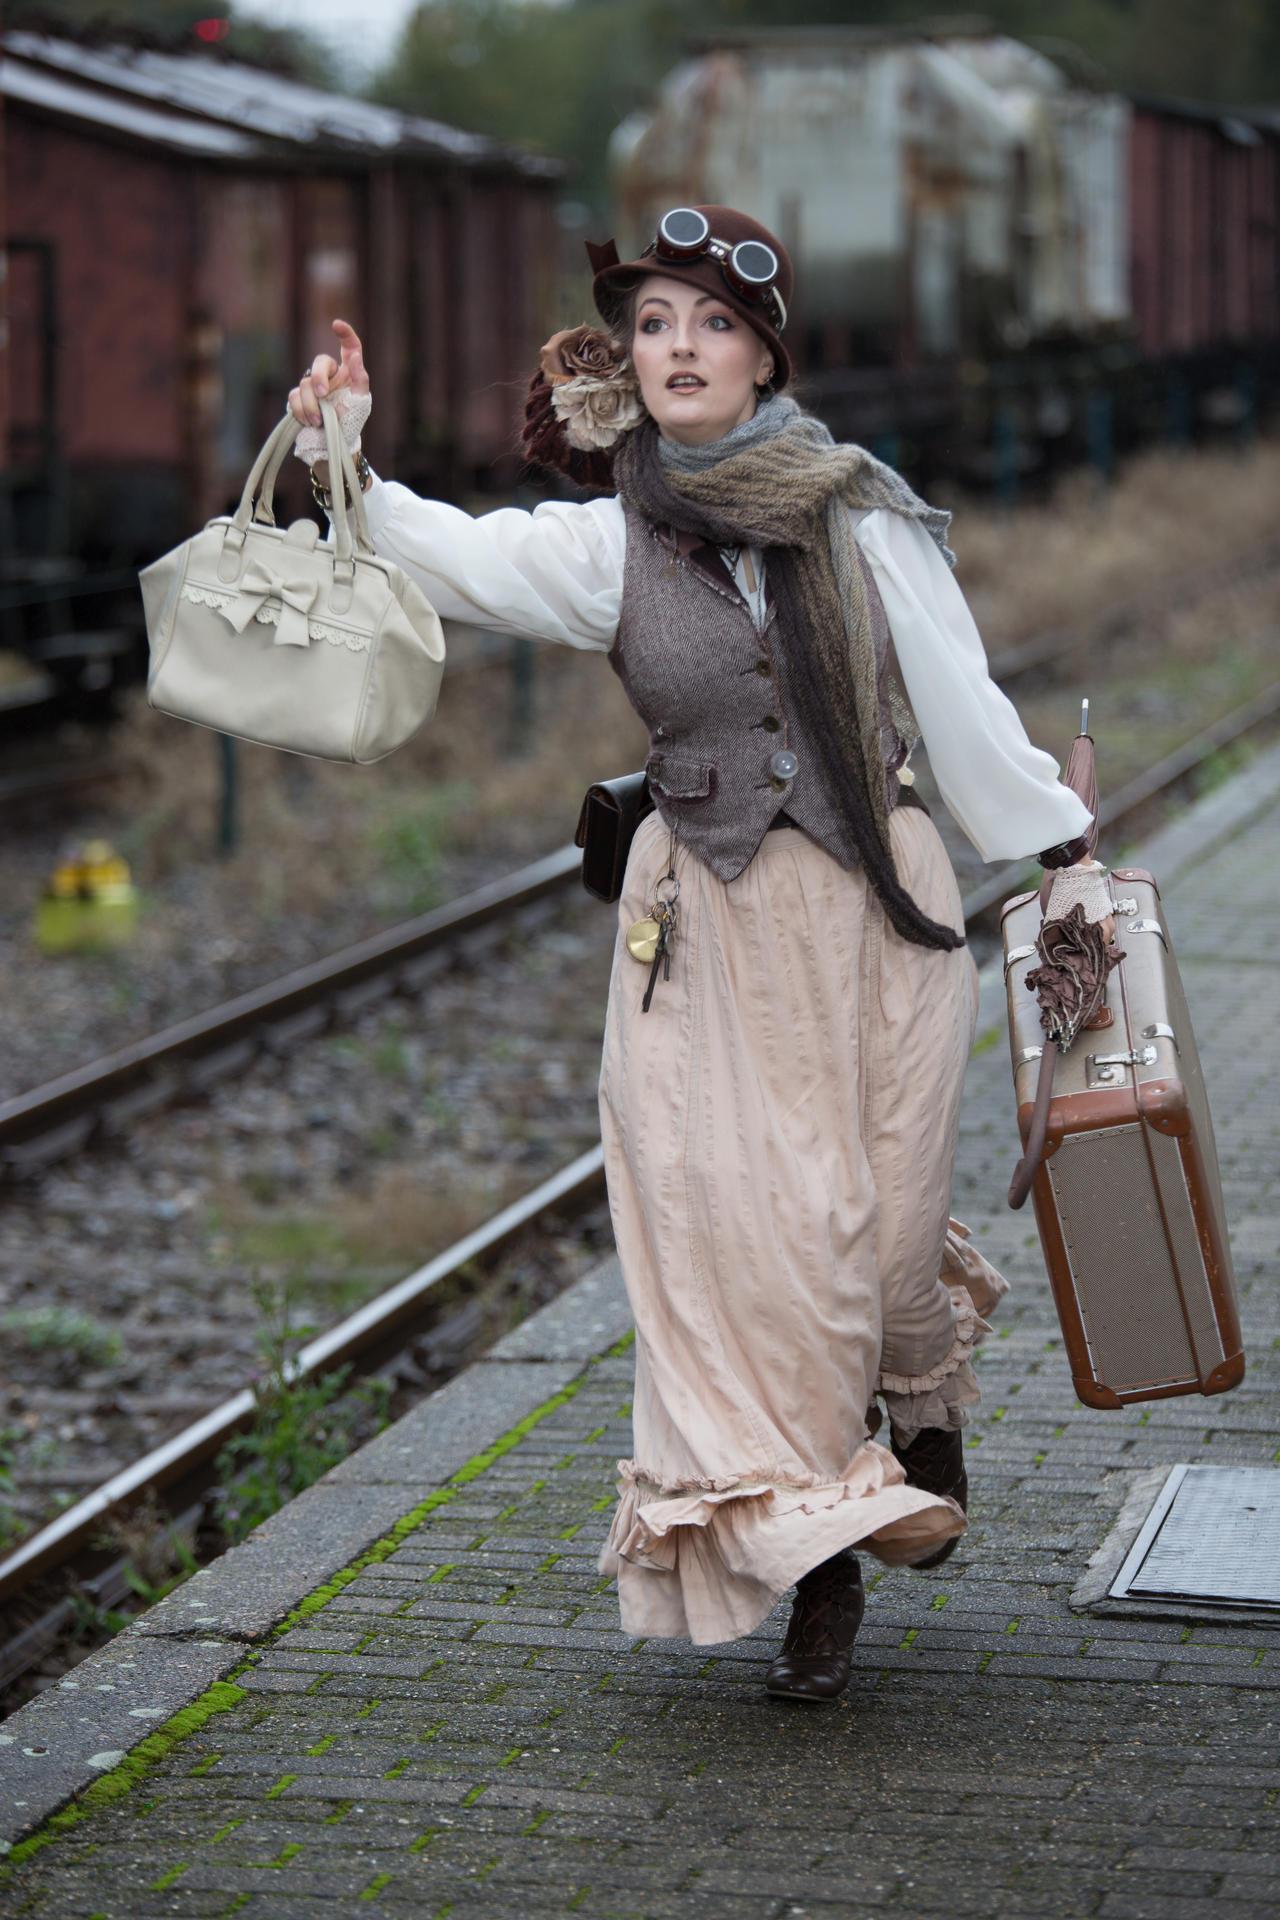 [STOCK] Running Steampunk girl at train station